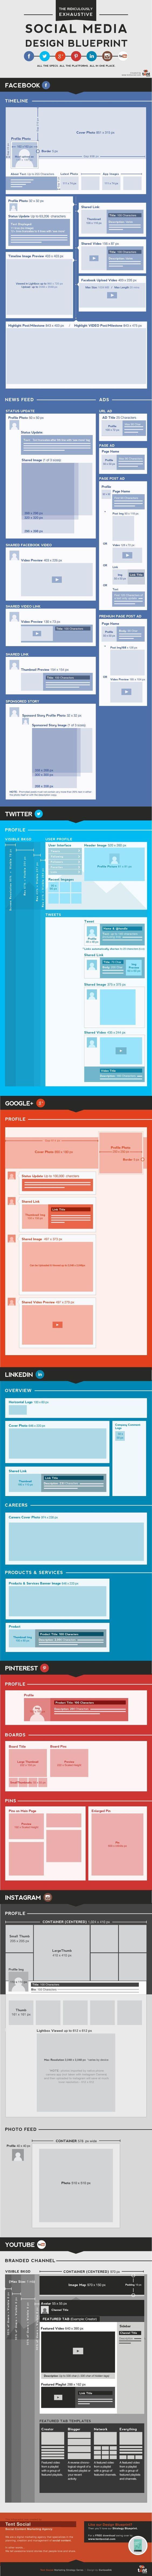 Mejores 86 imgenes de smo social media optimisation en pinterest digital marketing agency malvernweather Image collections